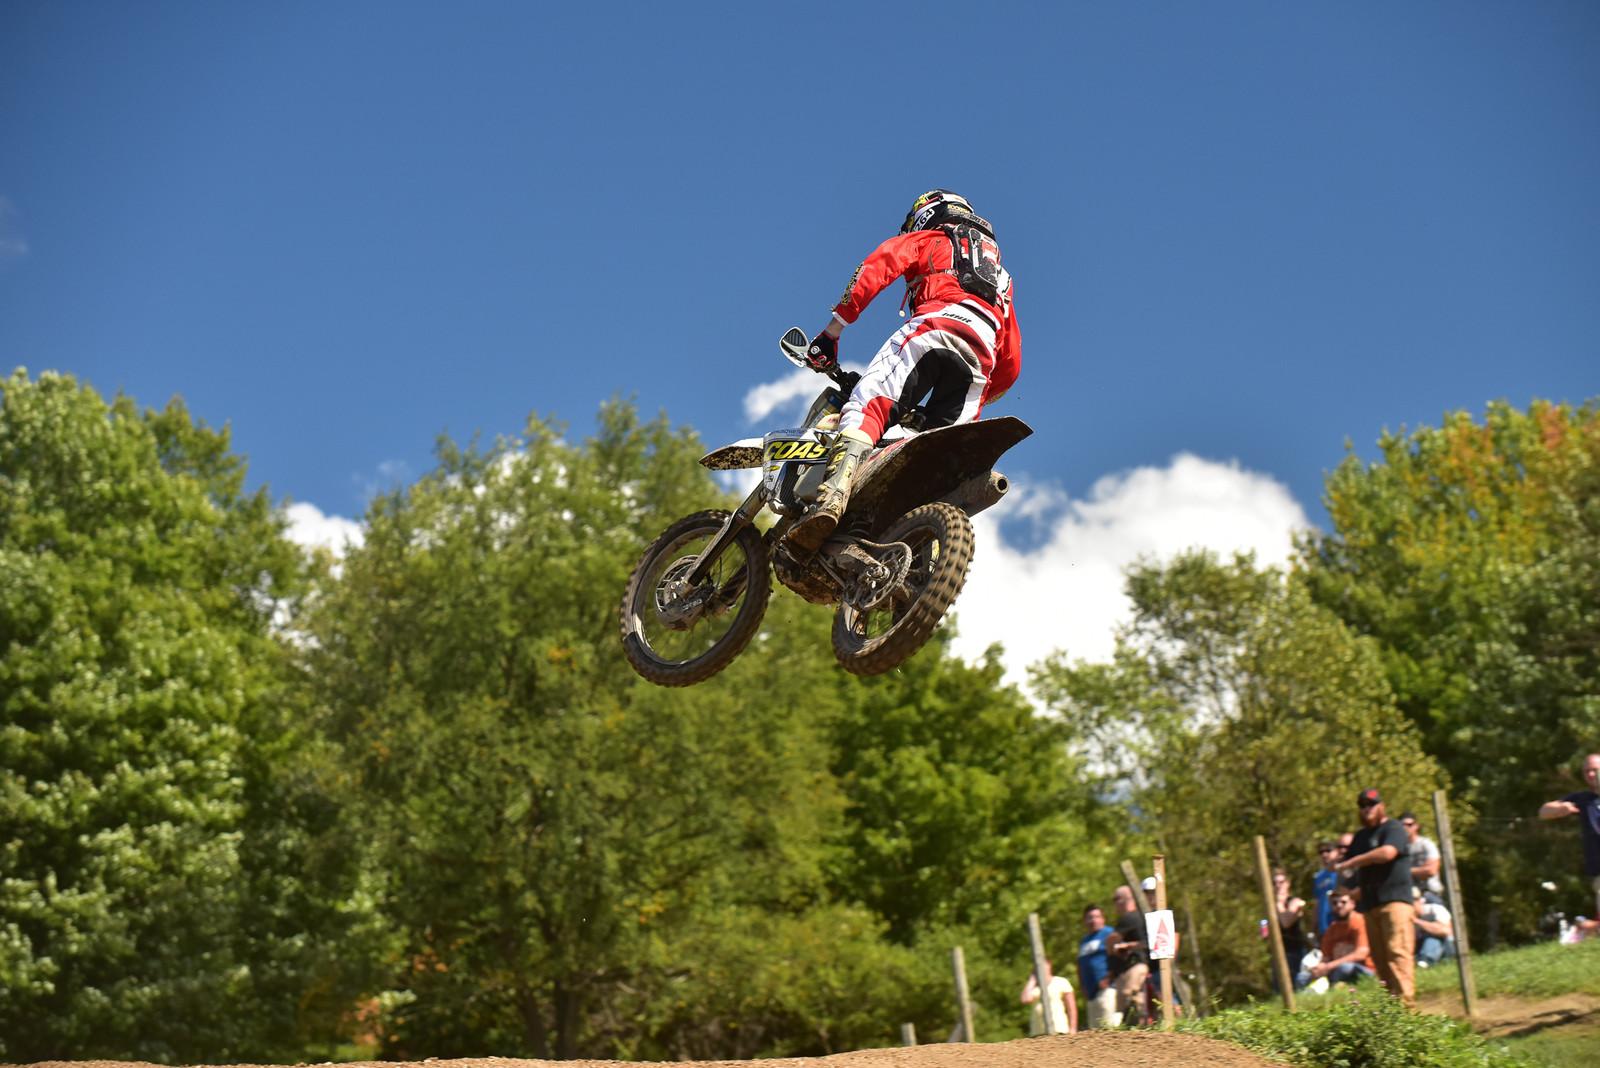 Ryan Sipes - Unadilla GNCC - Motocross Pictures - Vital MX